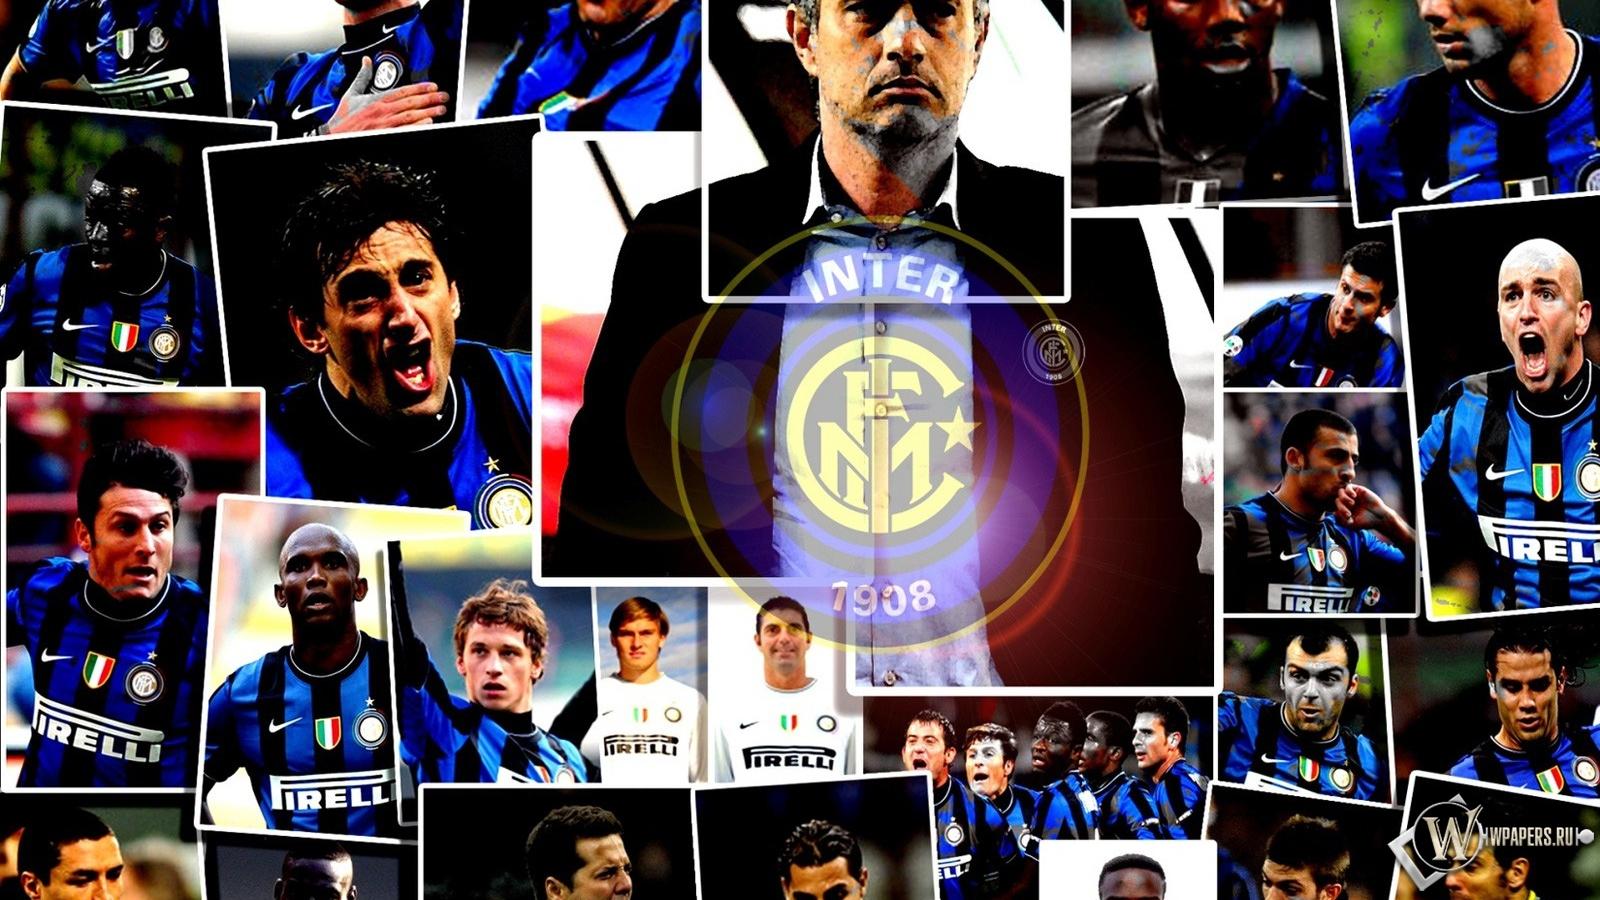 Milan футбол обоев 73 футболисты обоев 3